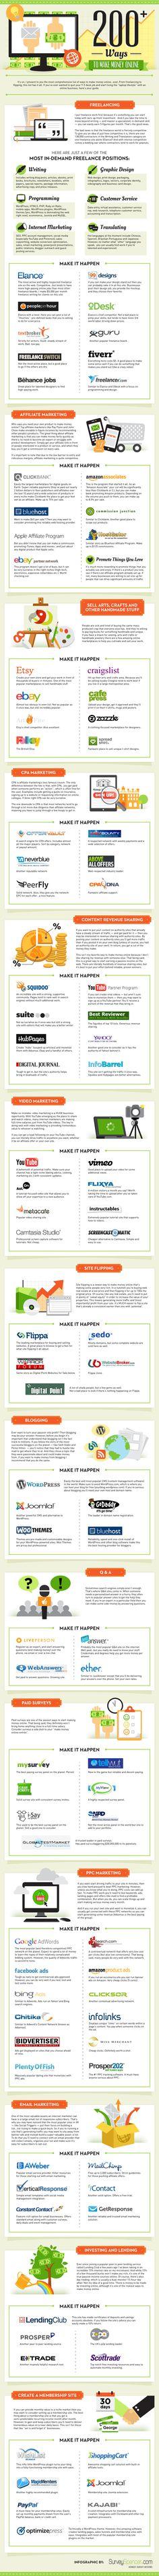 200 Ways To Make Money Online #infographic